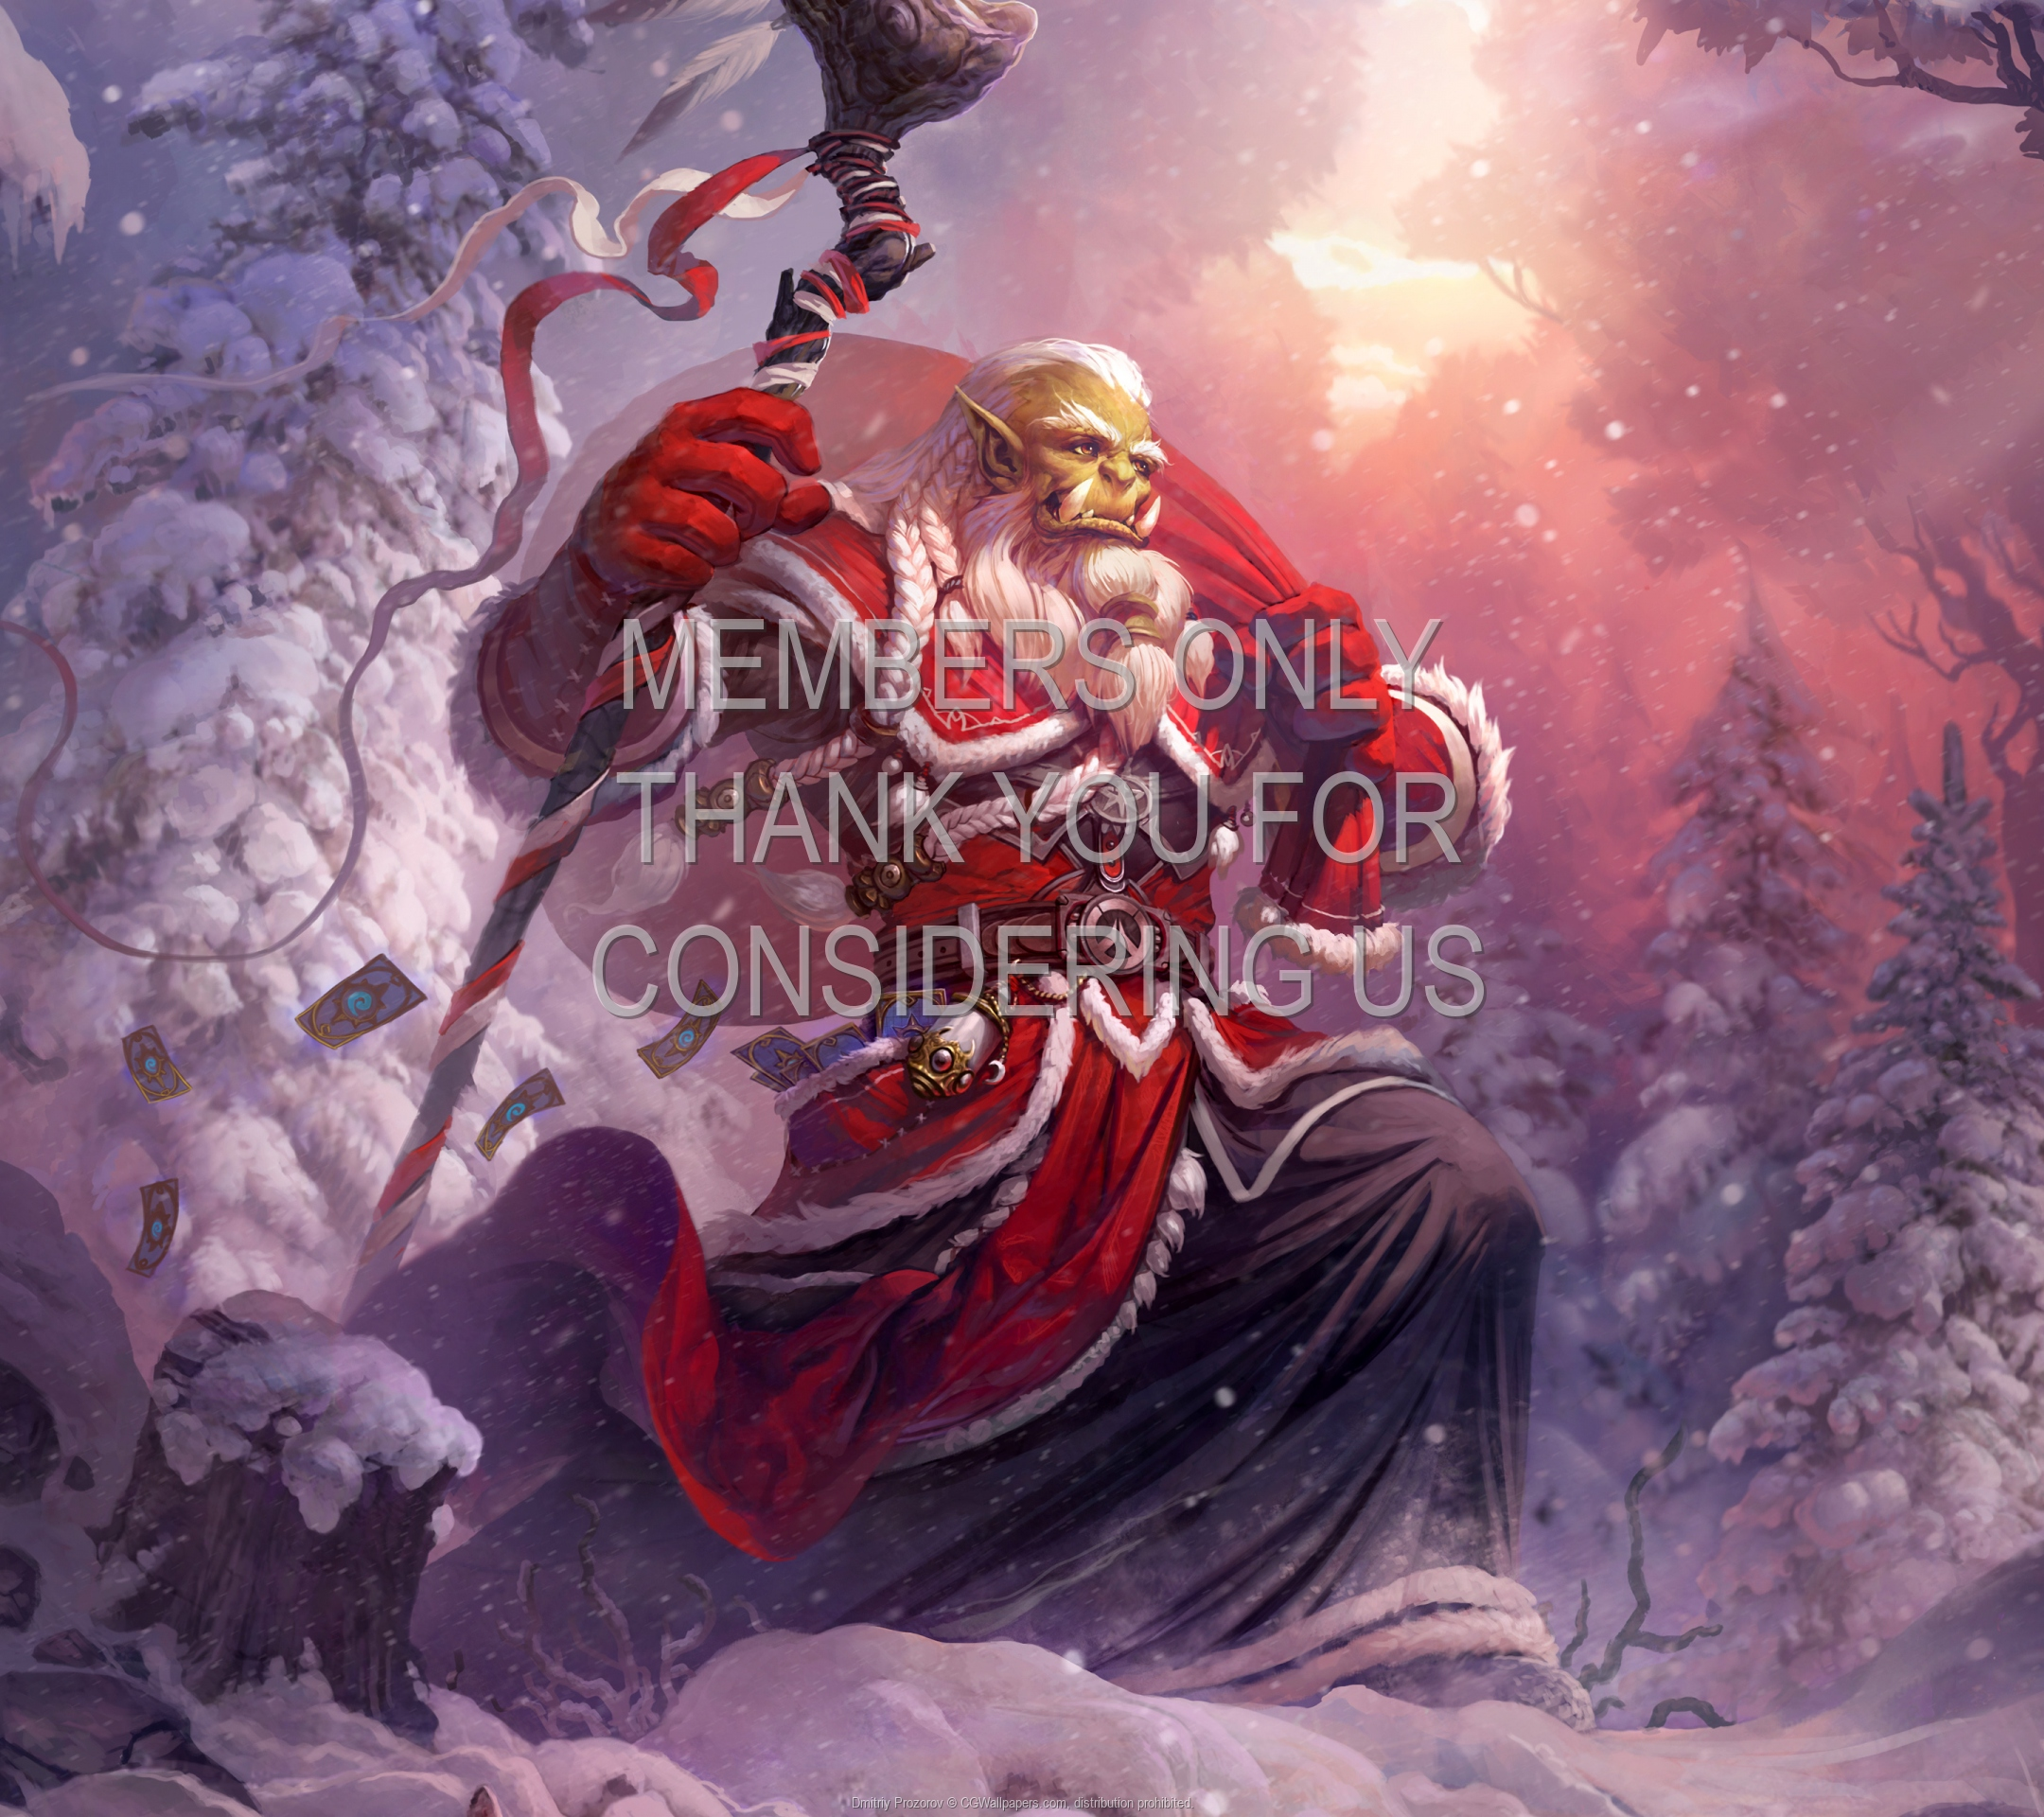 Dmitriy Prozorov 1080p Horizontal Mobile wallpaper or background 07